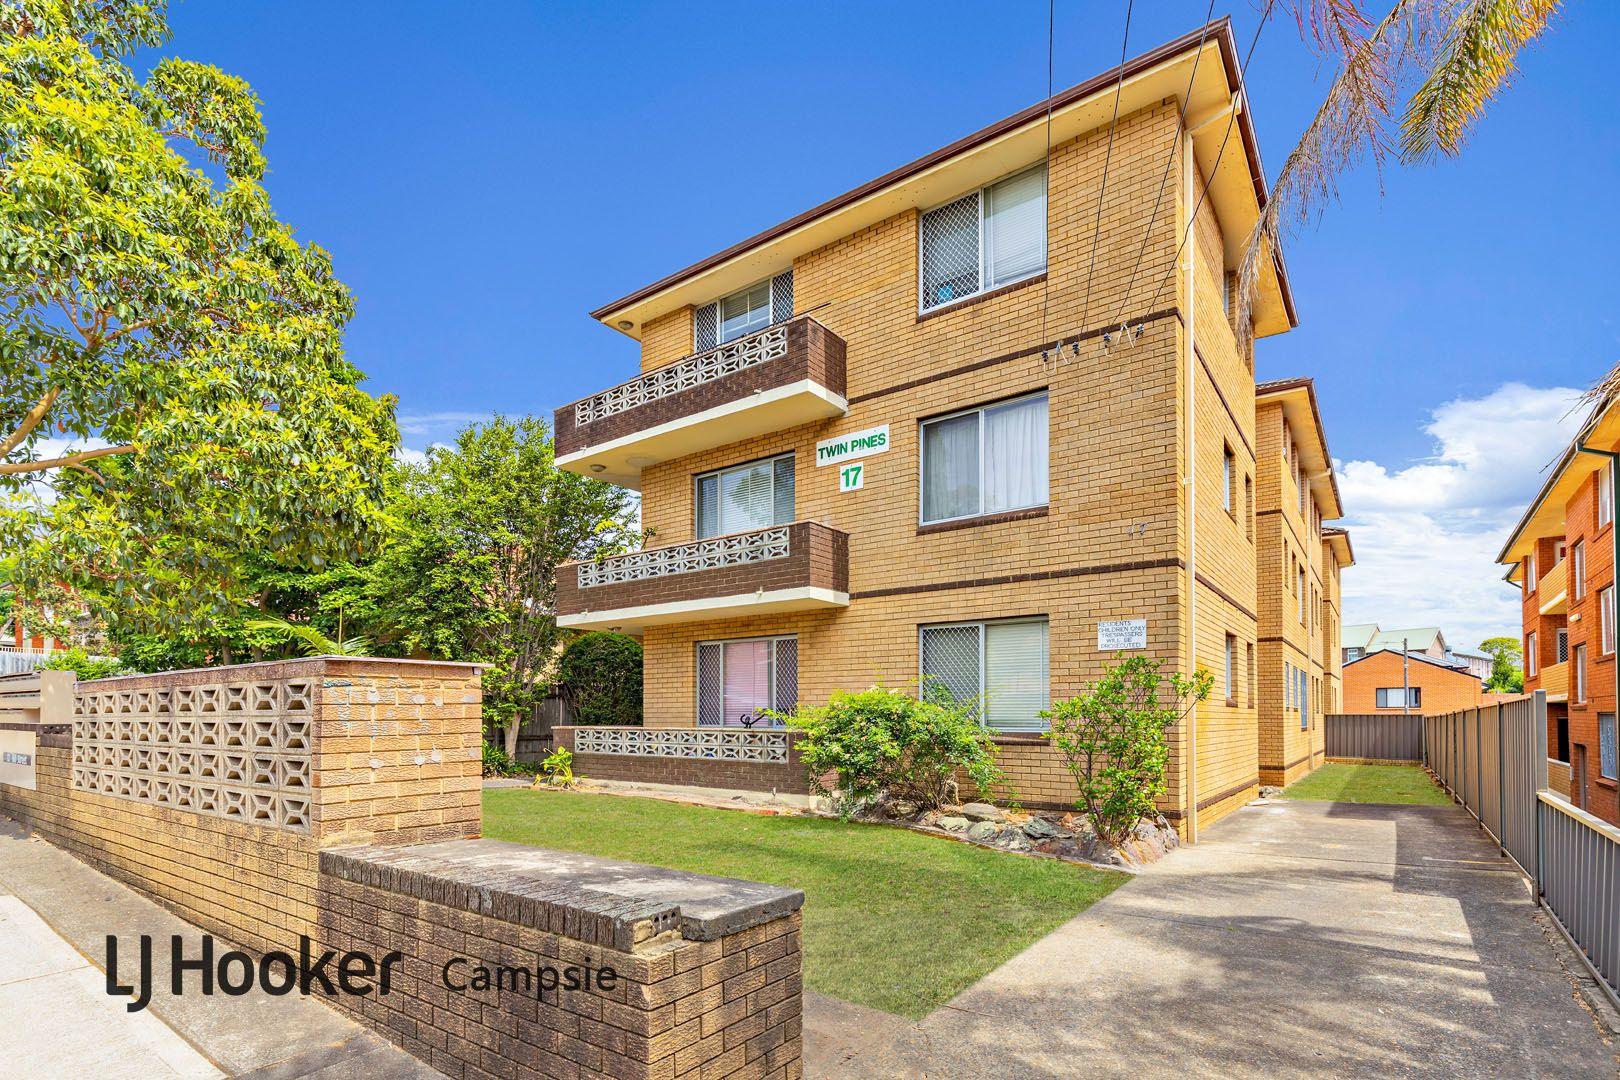 7/17 Hill Street, Campsie NSW 2194, Image 0